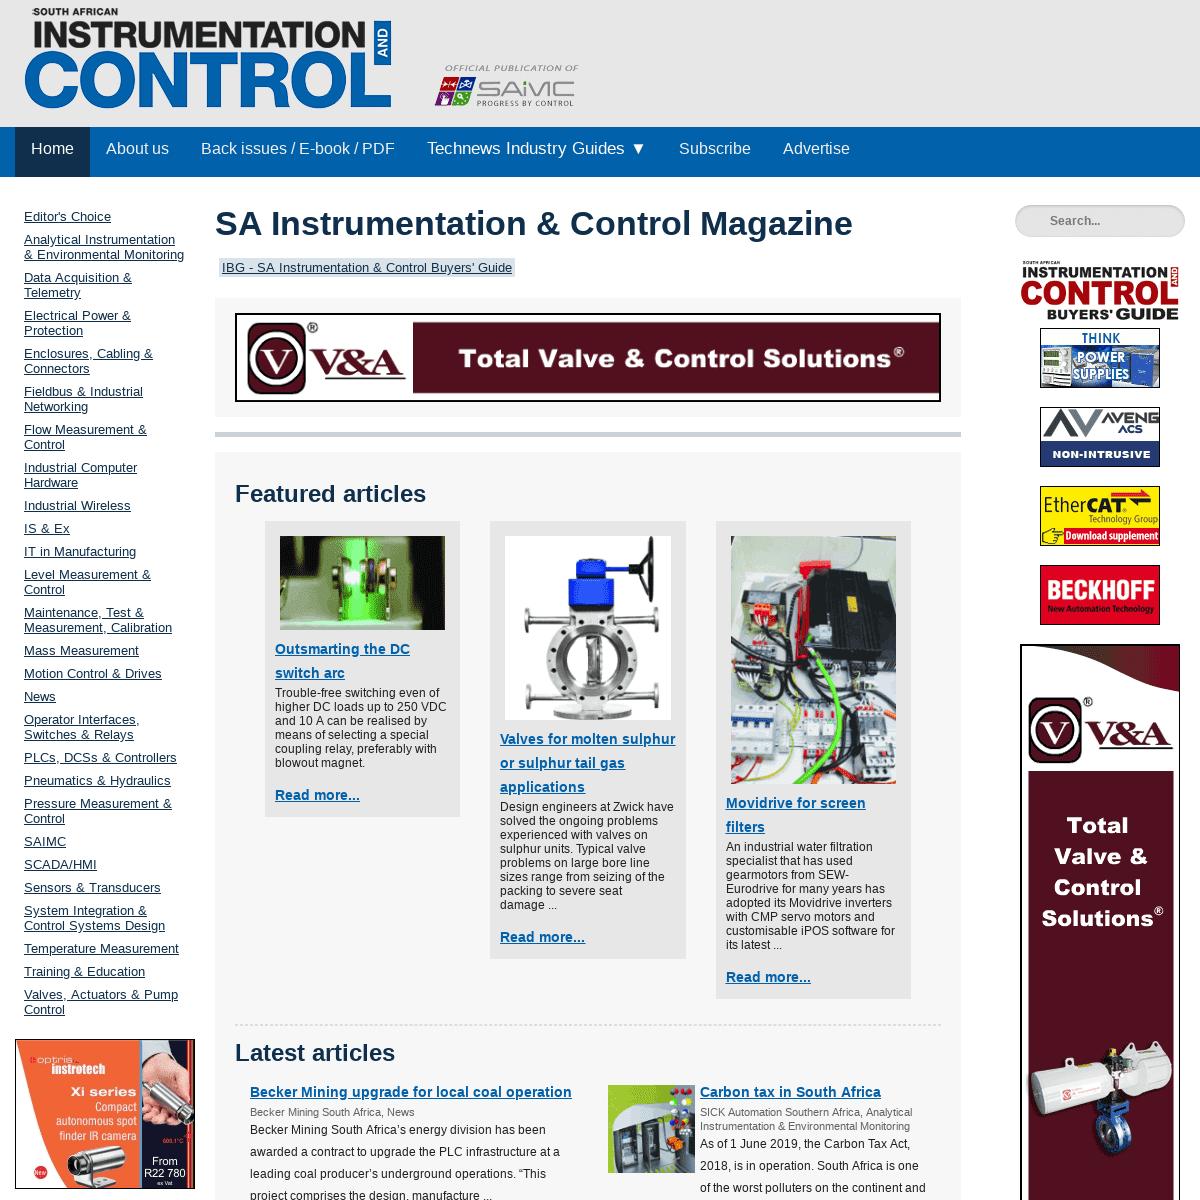 SA Instrumentation & Control